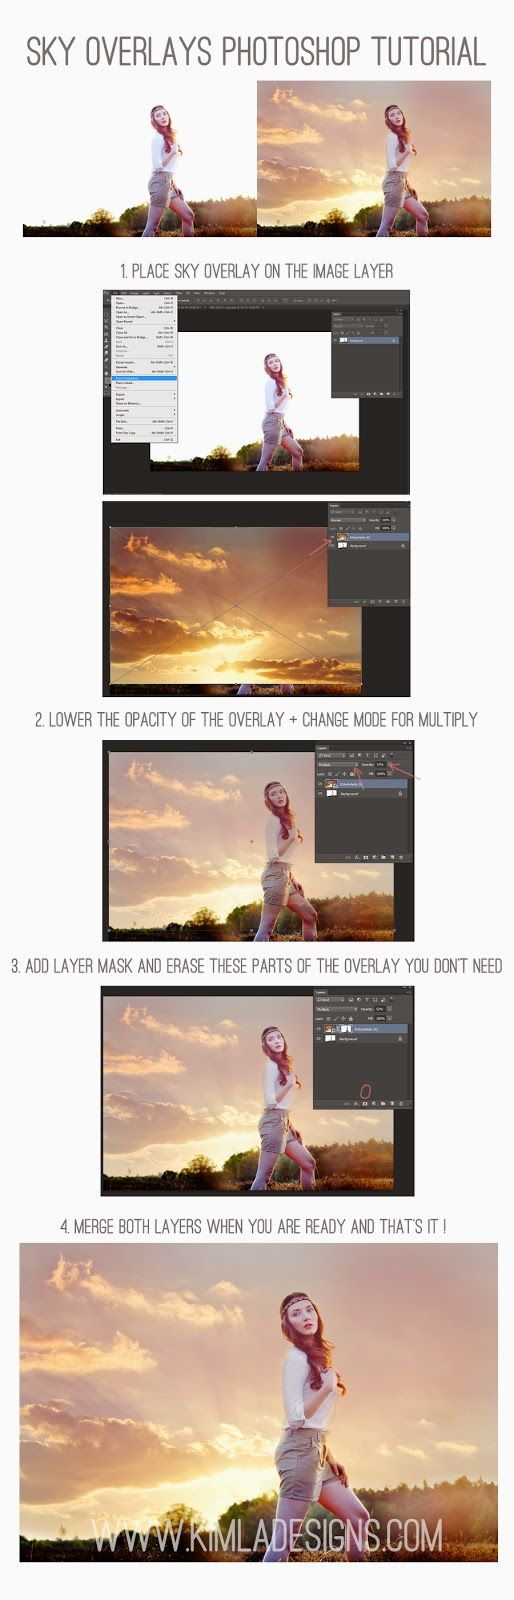 KIMLA DESIGNS: English Sky Overlays Photoshop Tutorial